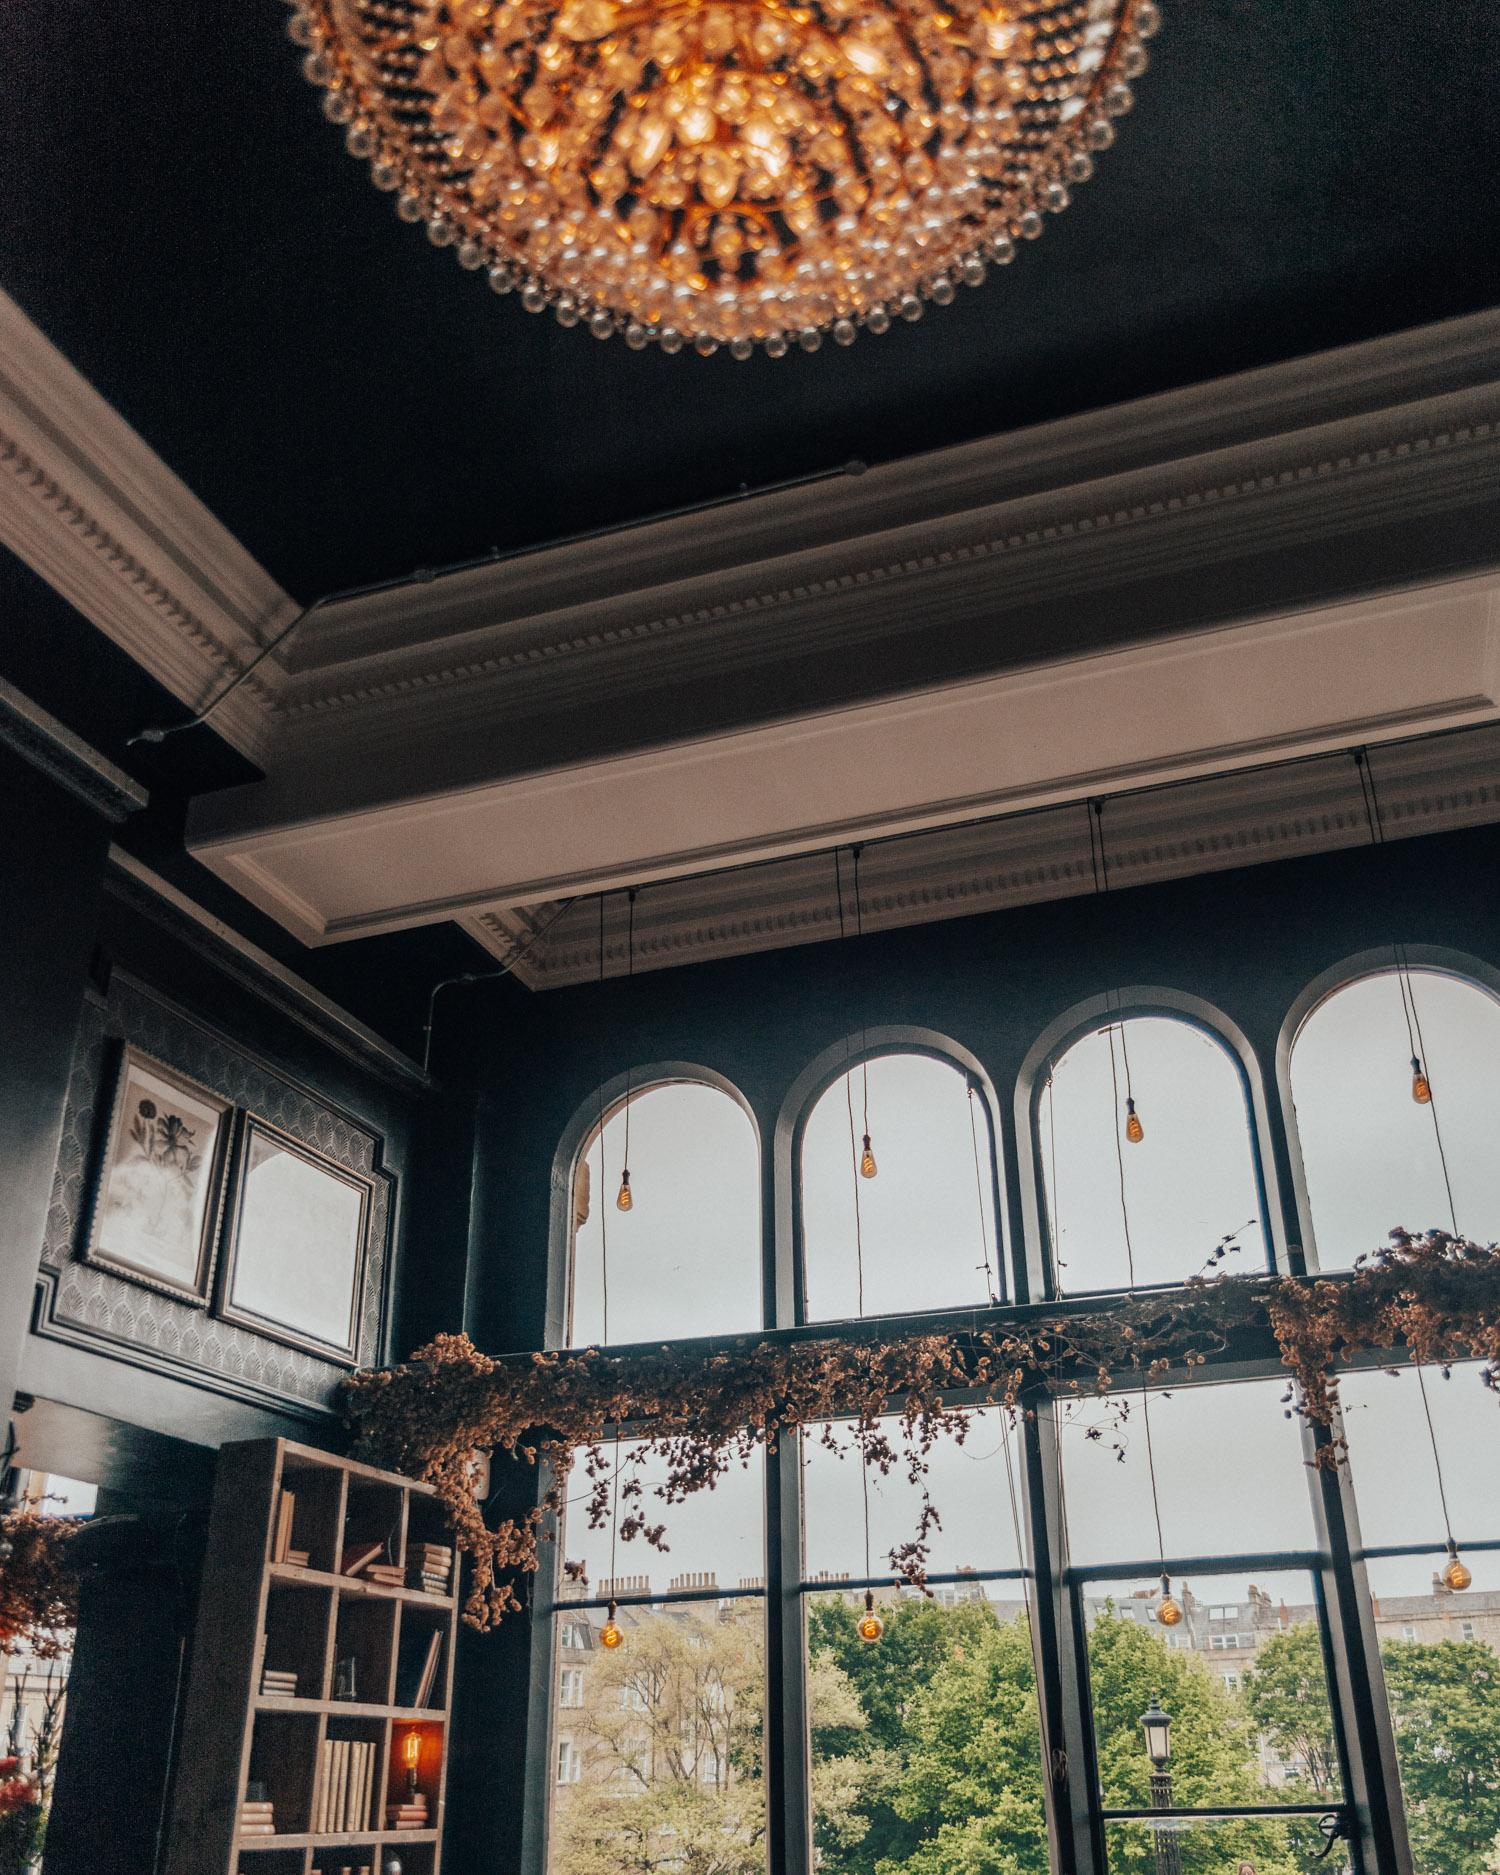 Framptons Cafe Bar & Kitchen